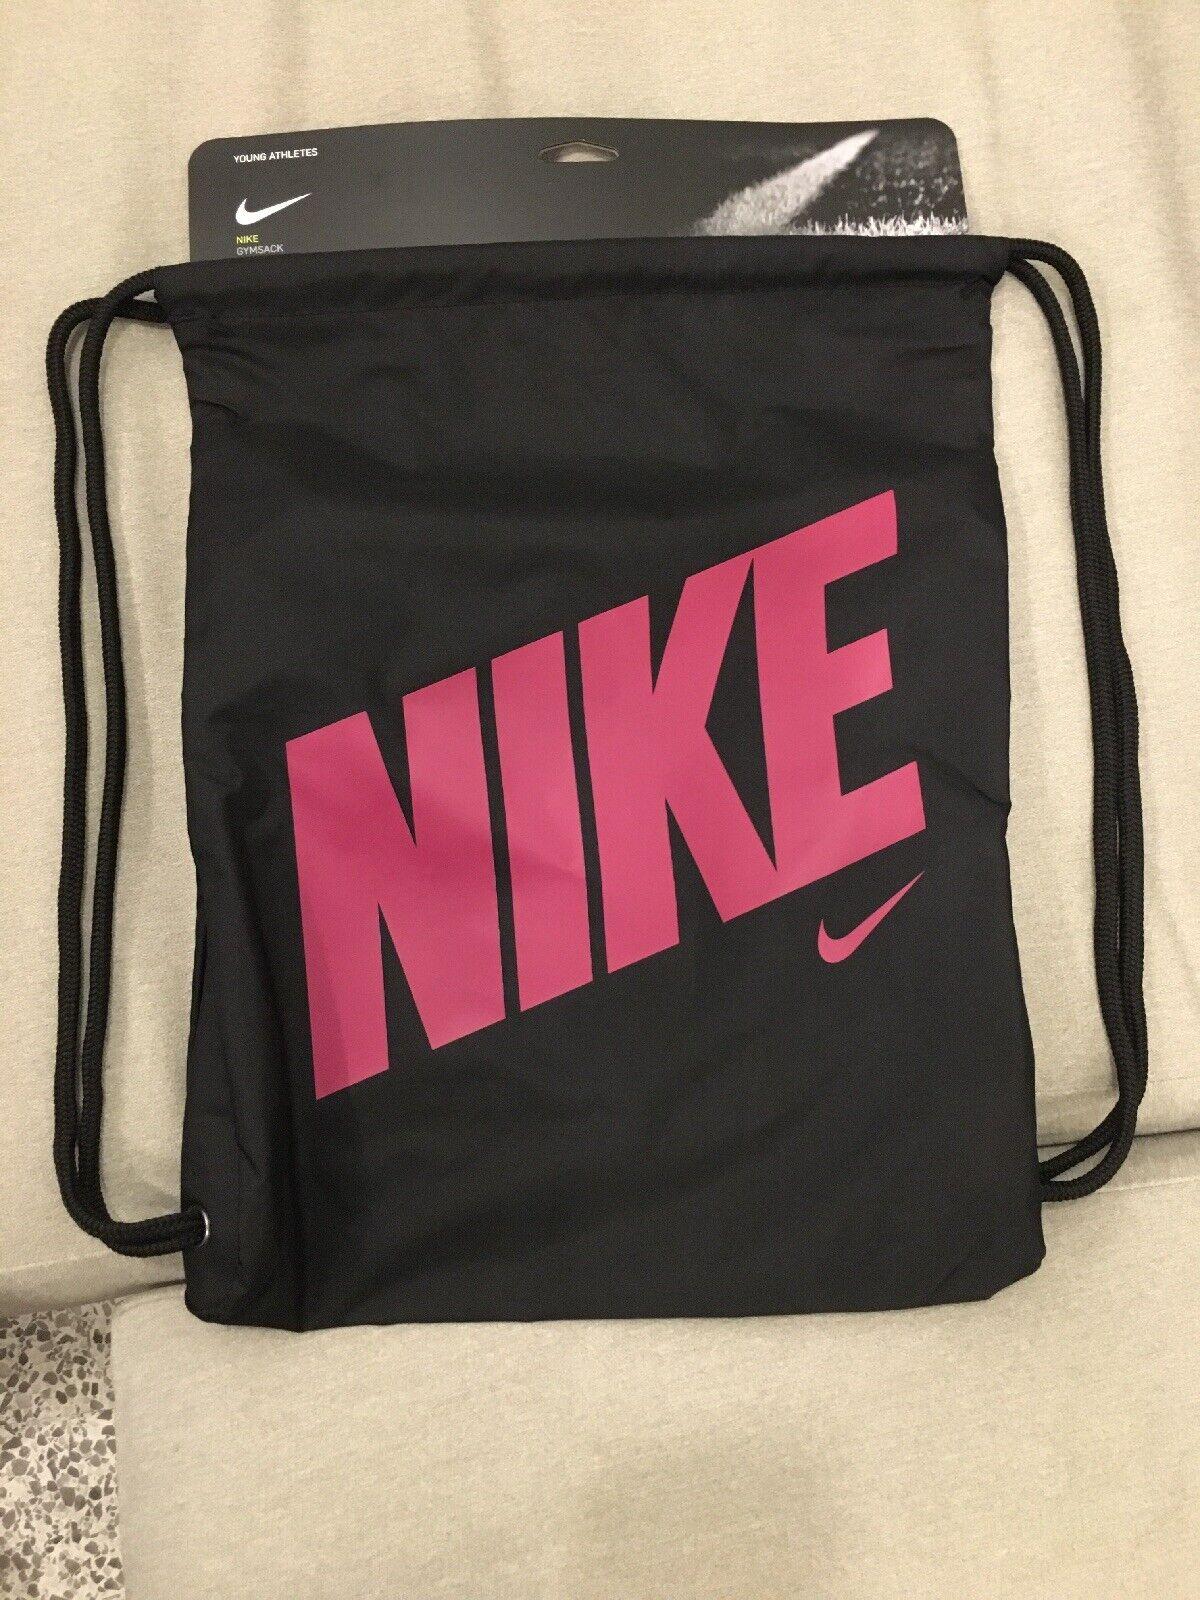 odio Contratista Hormiga  Nike Heritage Gymsack Lightweight Drawstring Bag Black/rush Pink Ba5262 016  for sale online | eBay